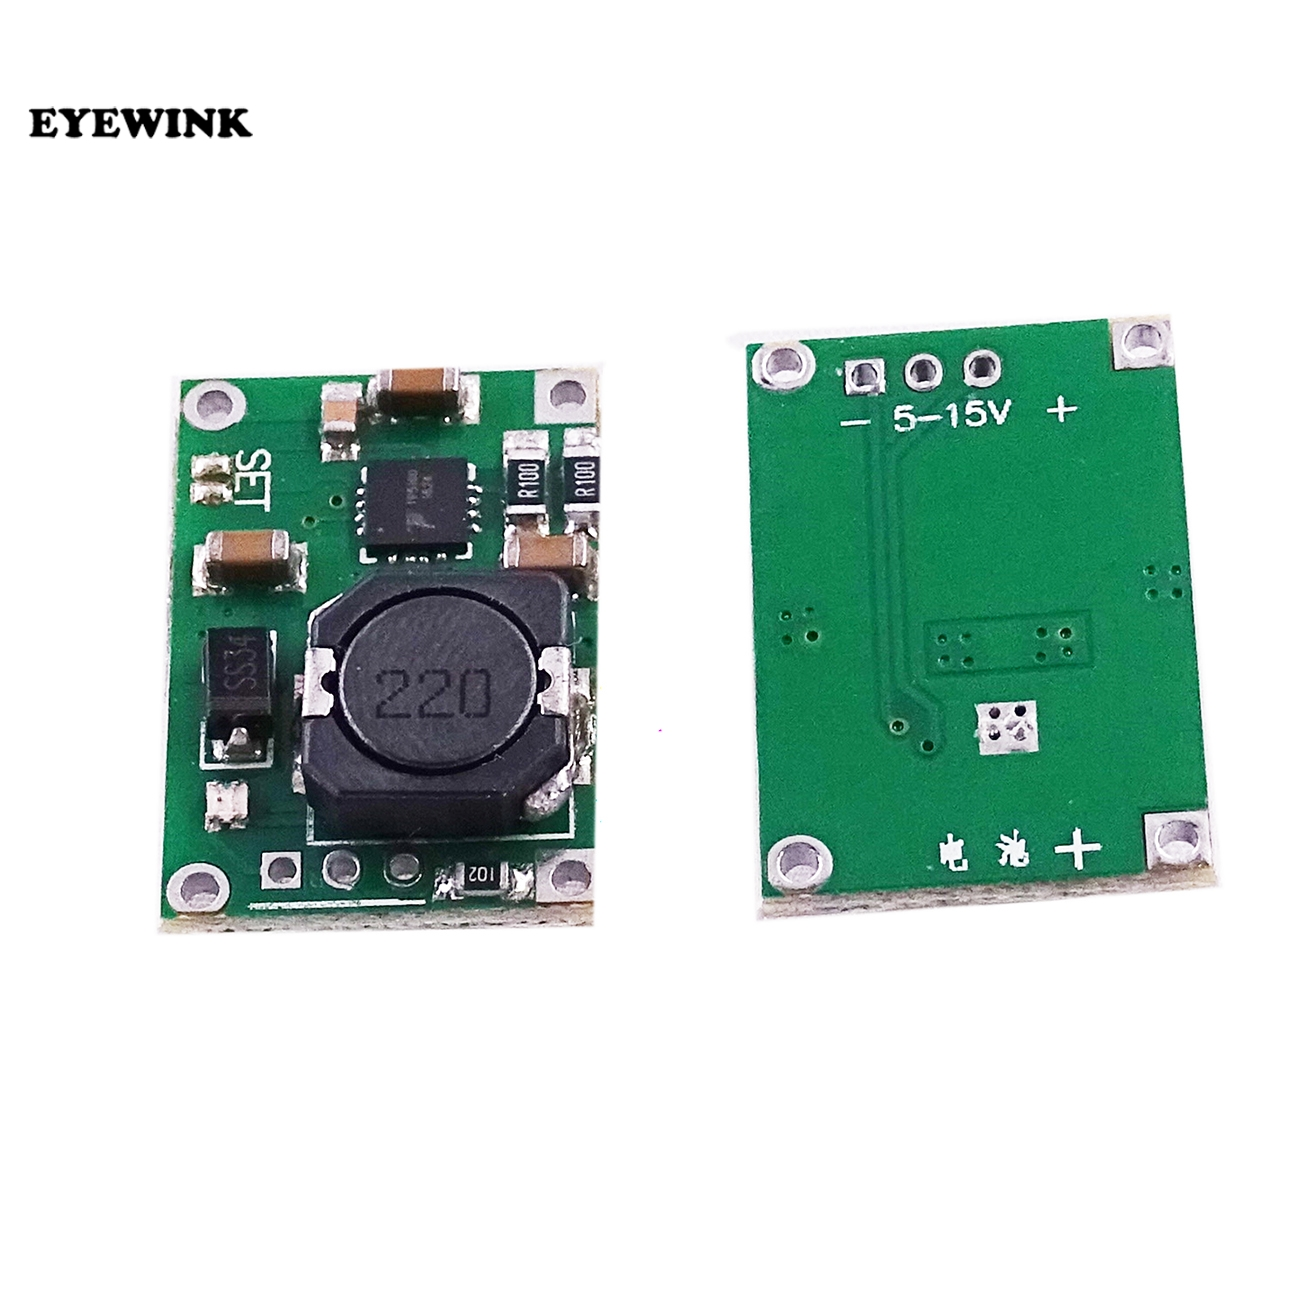 TP5100 2 ячейки/одна литиевая ионная батарея зарядное устройство Модуль 1-2A PCB 18650 4,2 V 8,4 V